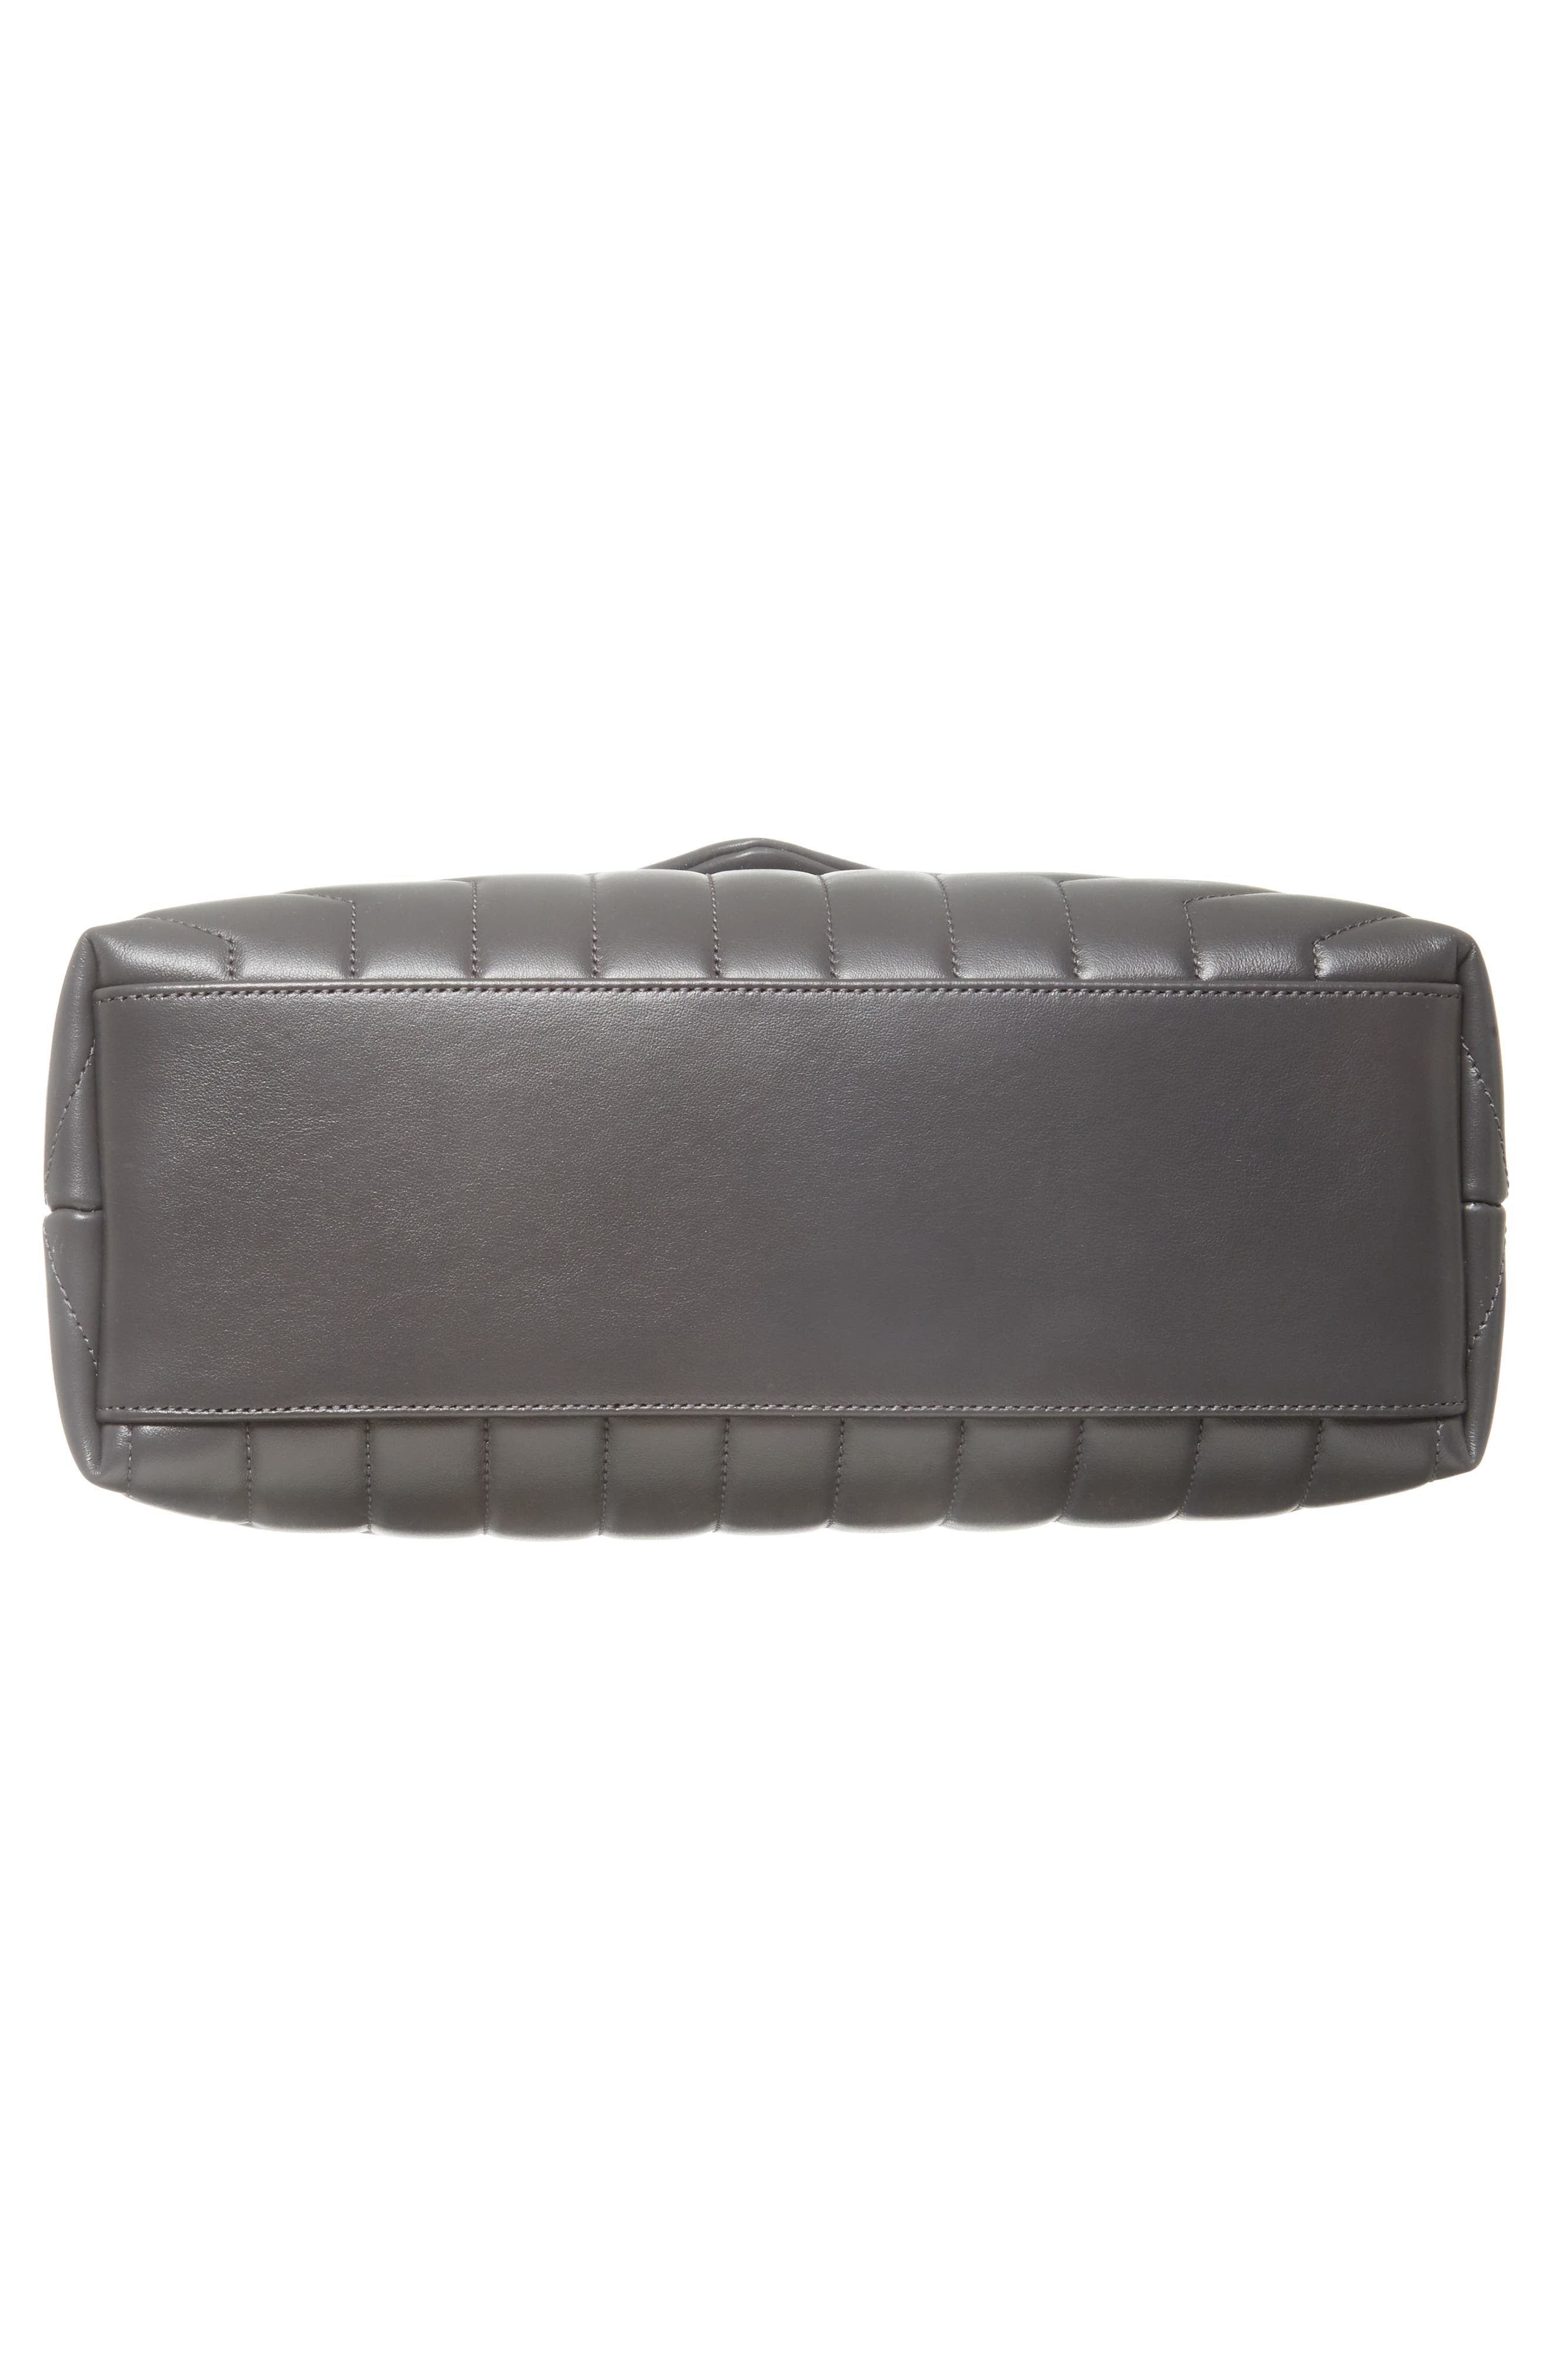 Medium Loulou Calfskin Leather Shoulder Bag,                             Alternate thumbnail 6, color,                             STORM/ STORM